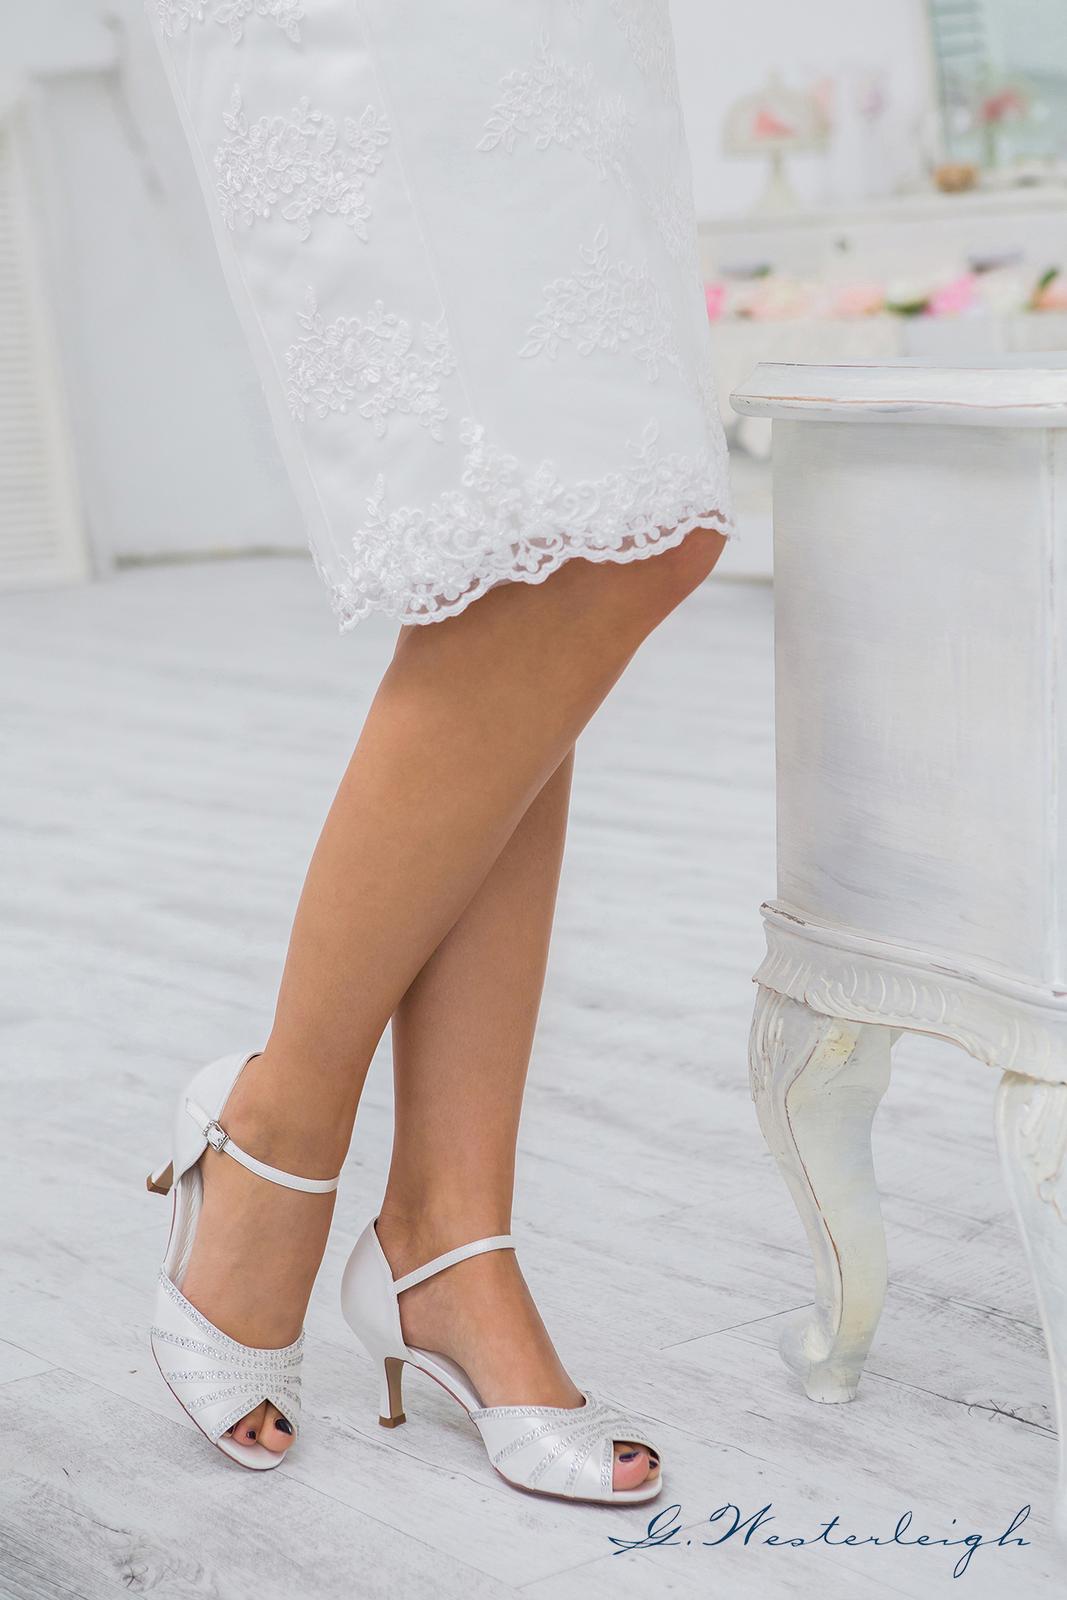 Svadobné topánky Jessica - Obrázok č. 4